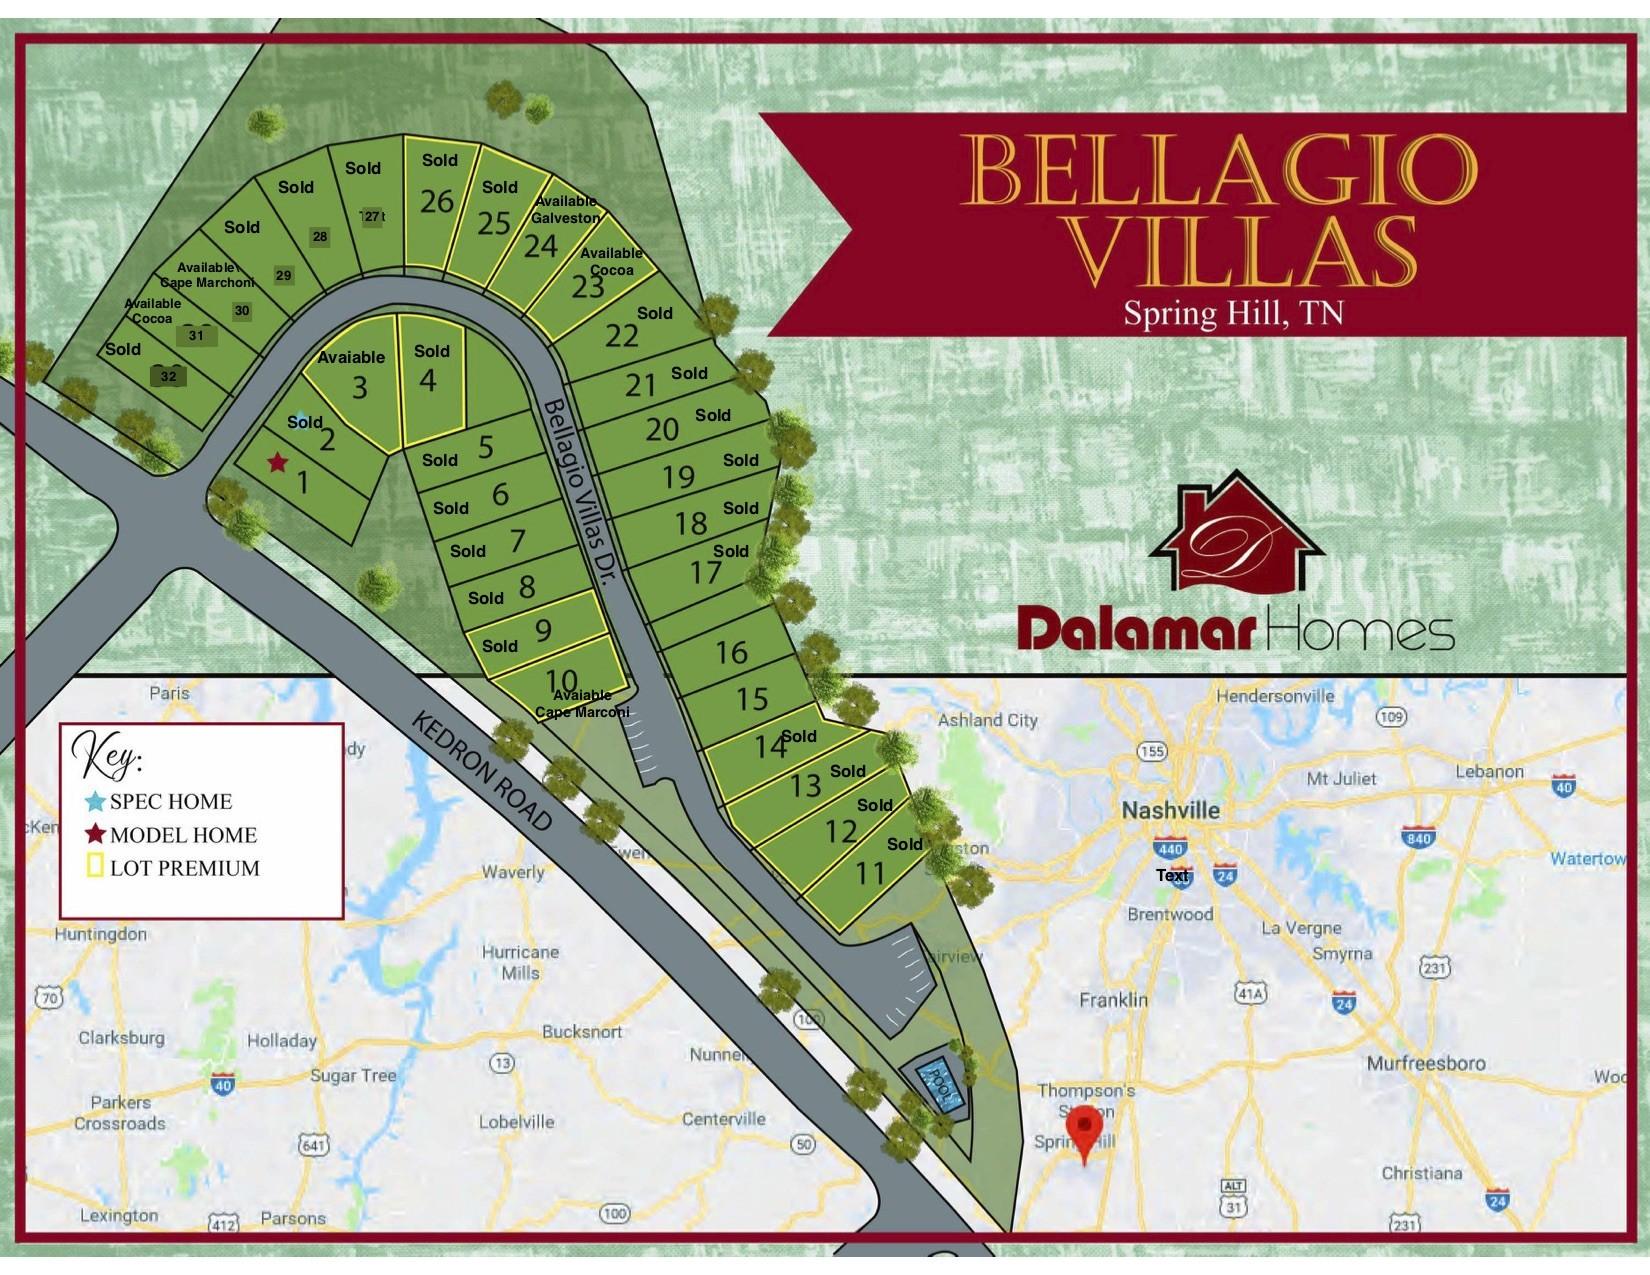 103 Bellagio Villas Drive 31 Property Photo - Spring Hill, TN real estate listing